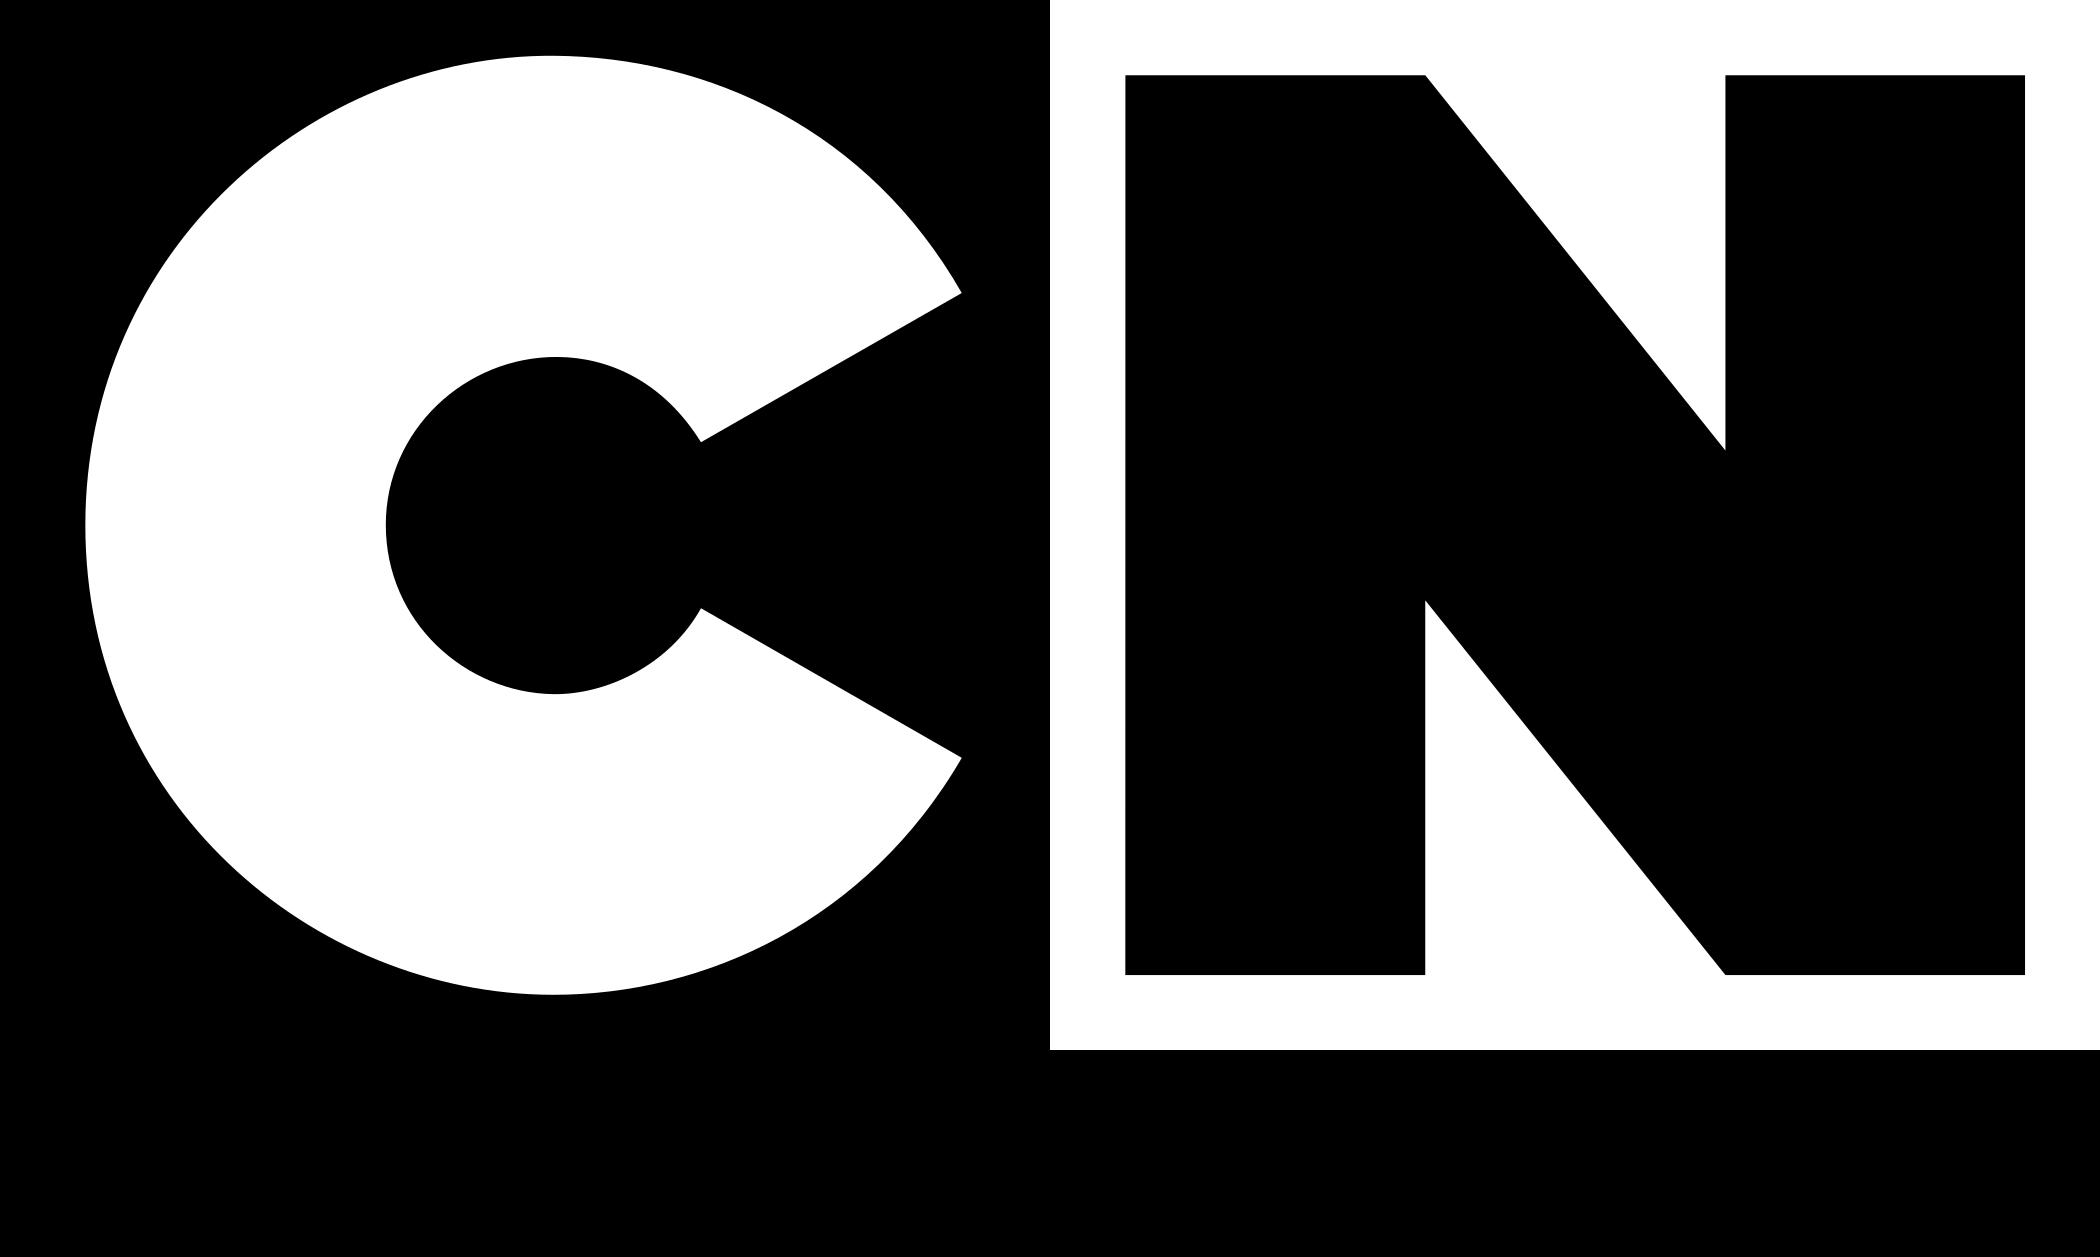 cartoon network logo 3 - Cartoon Network Logo